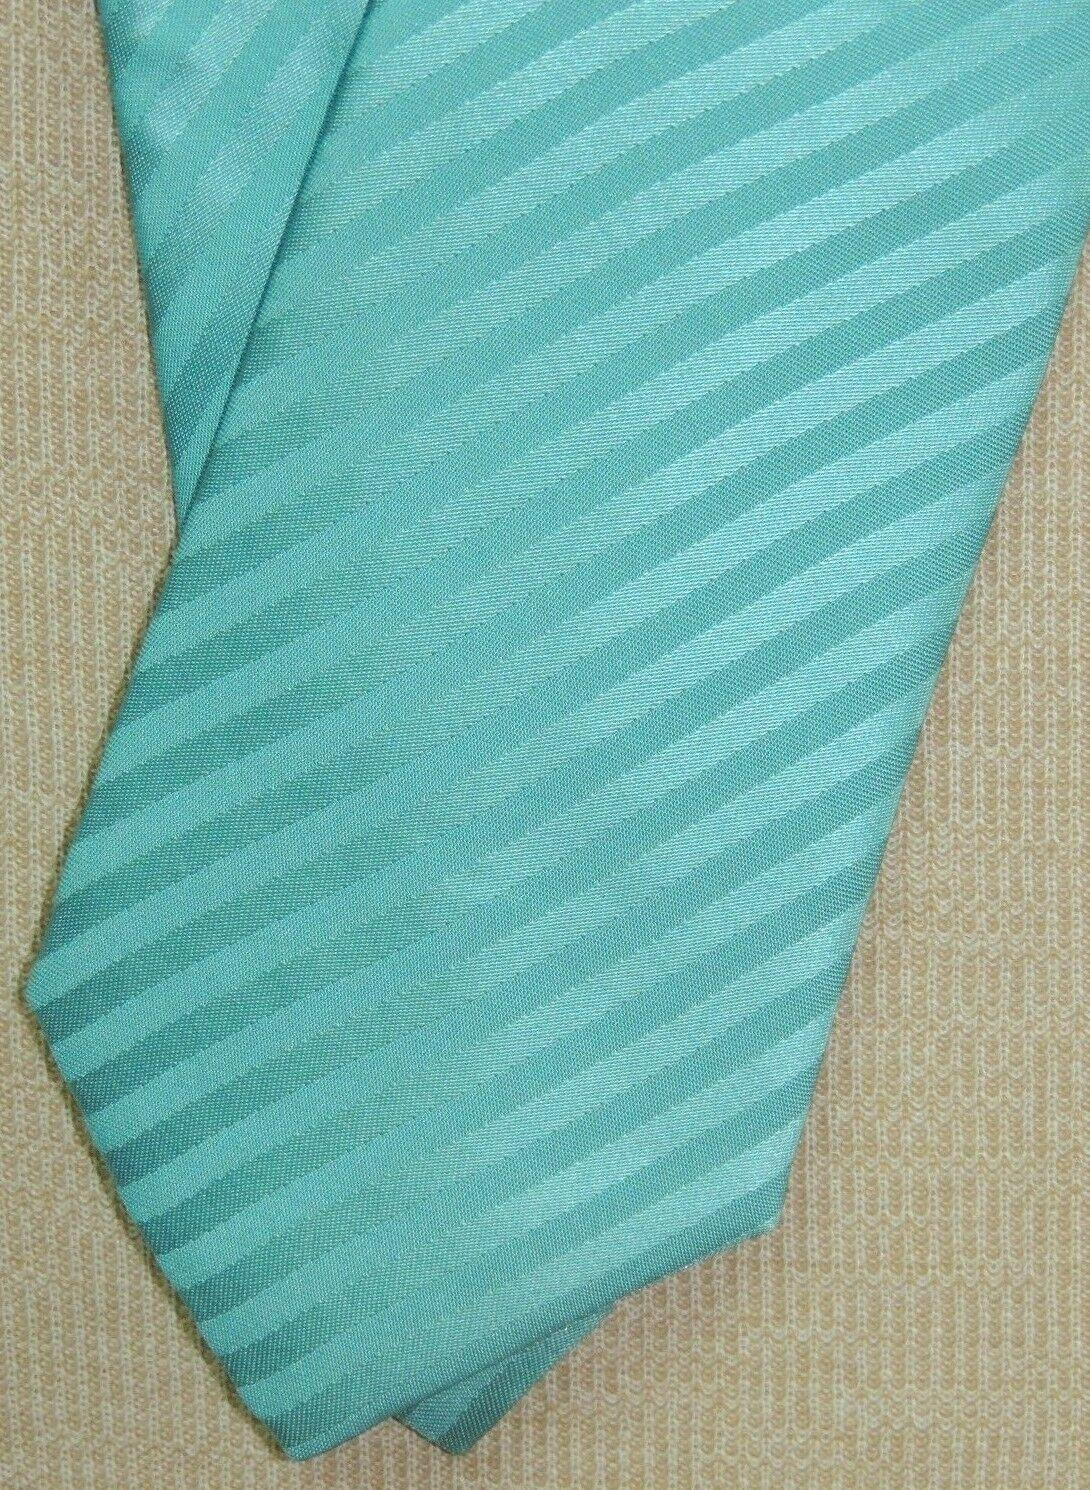 "Giorgio Armani Italy Neck Tie/Necktie Silk Teal Blue stripes 59""x3.75"" - $29.24"